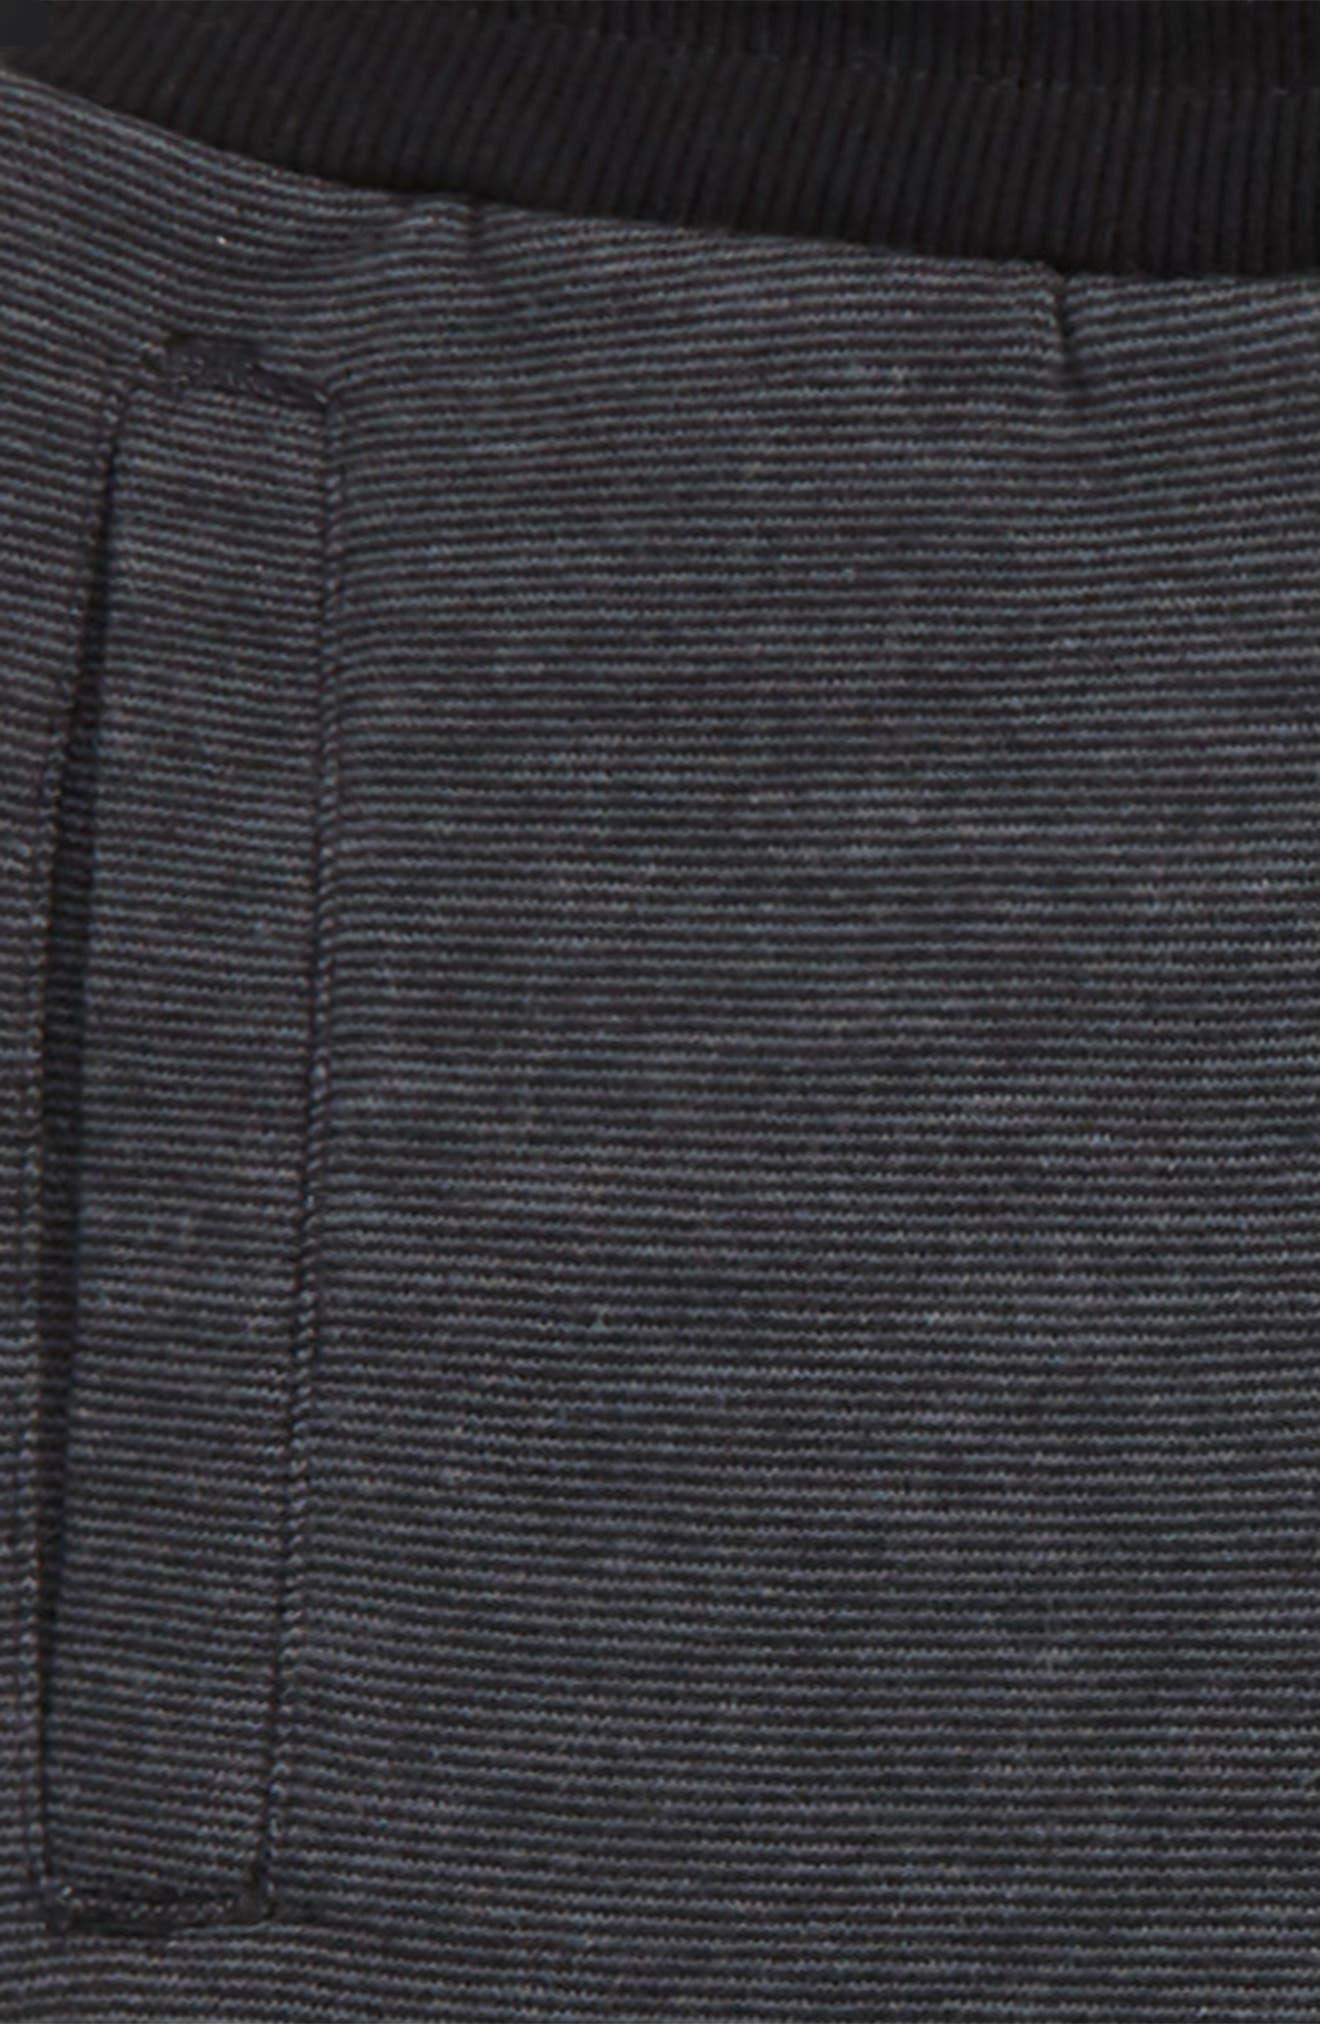 Balance Shorts,                             Alternate thumbnail 2, color,                             Black Heather